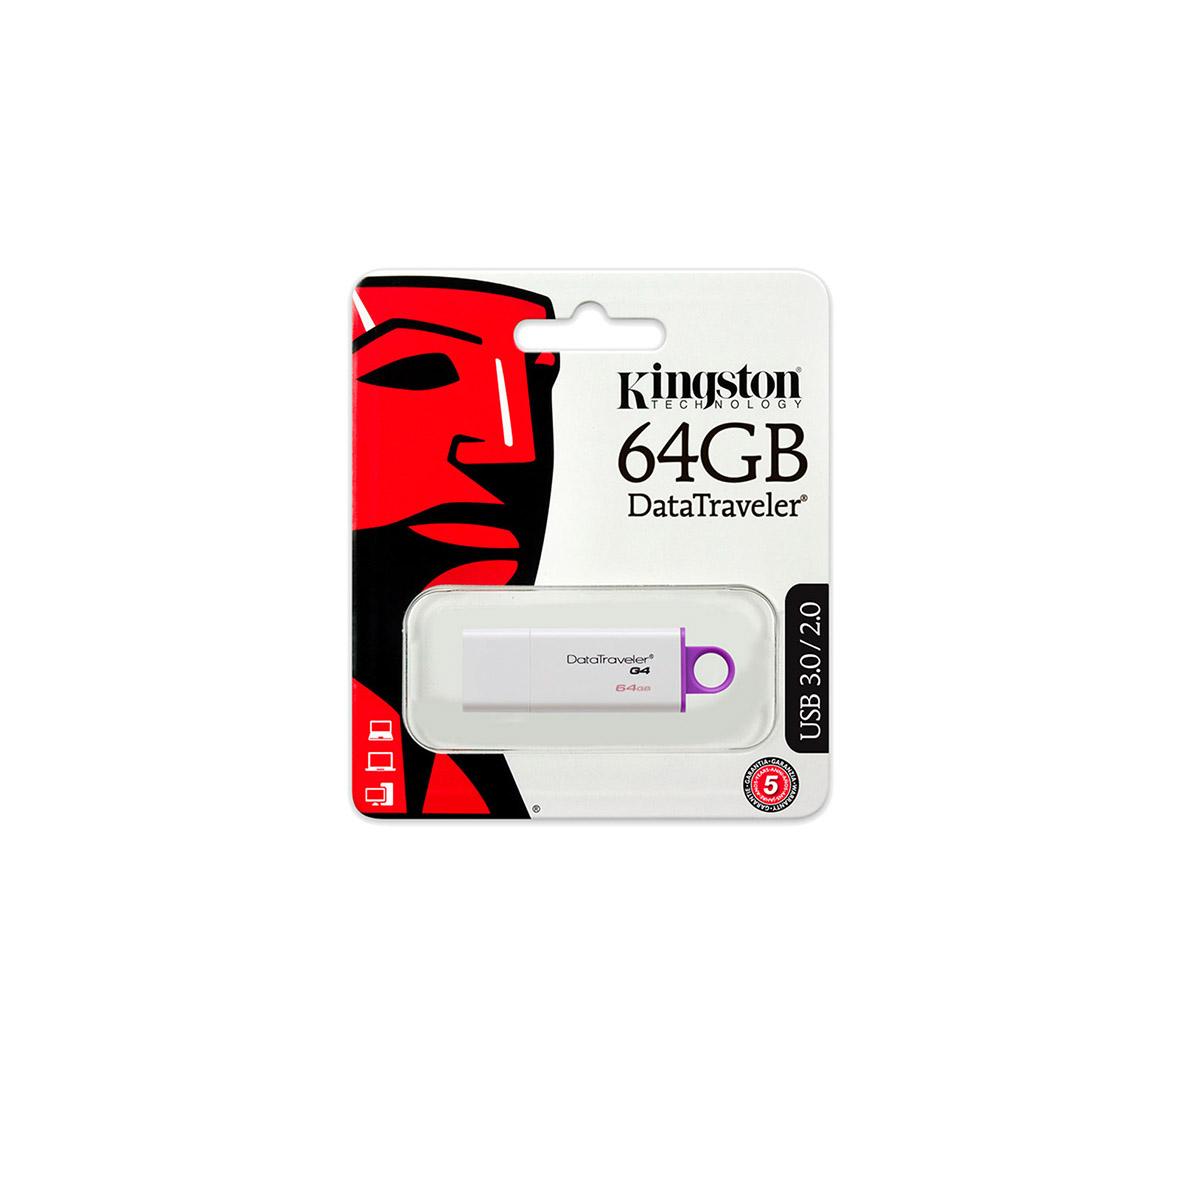 Pendrive Kingston 64GB USB Data Traveler DTIG4/64GB